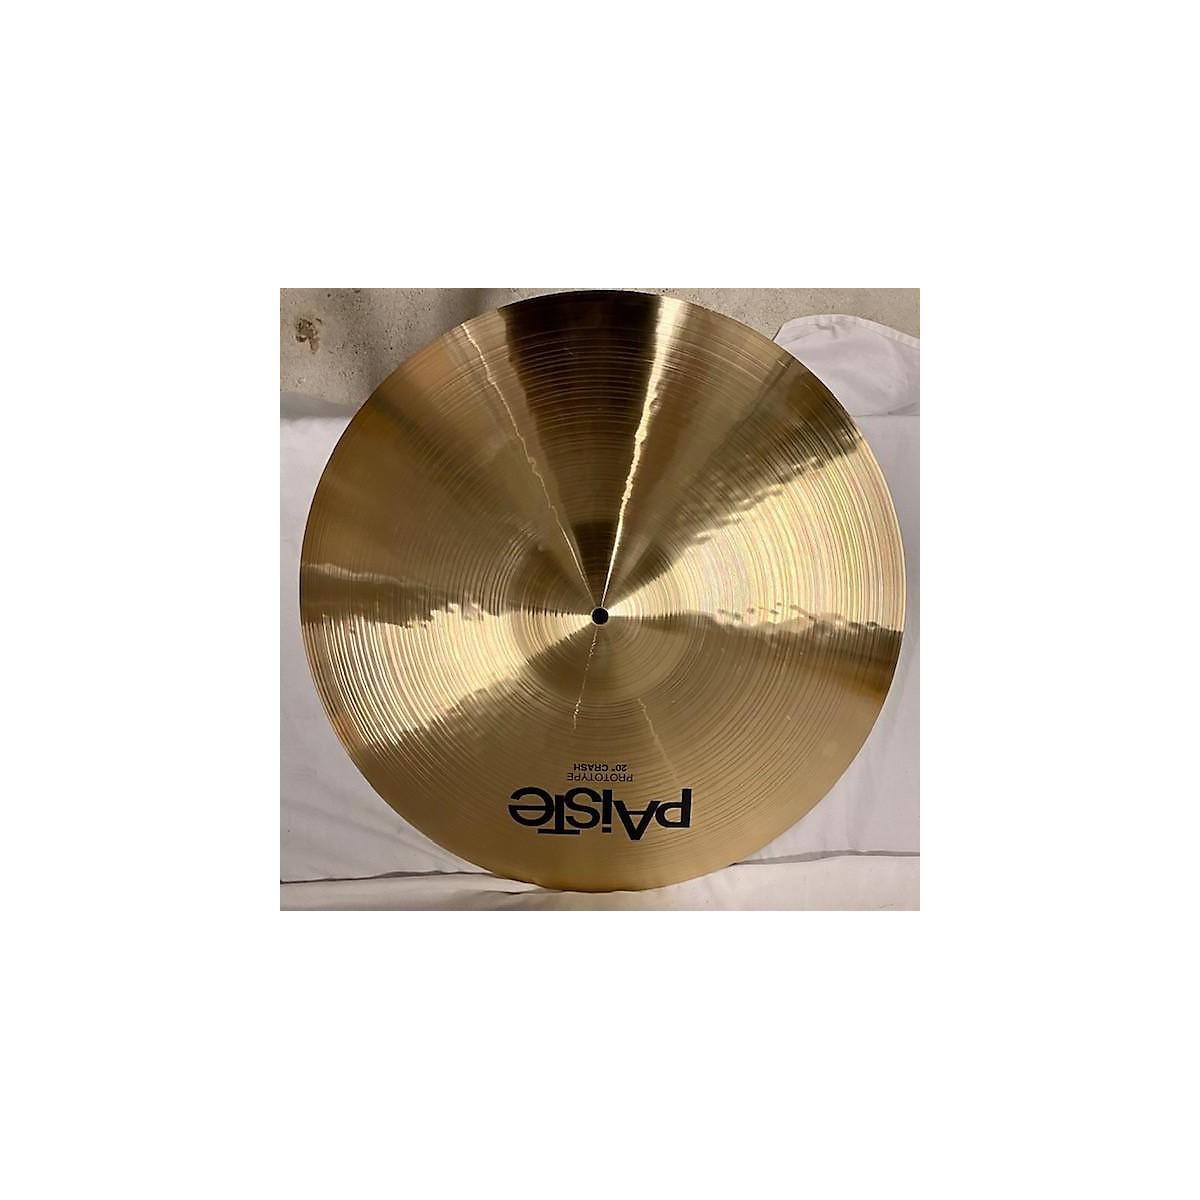 Paiste 20in Prototype Crash Cymbal